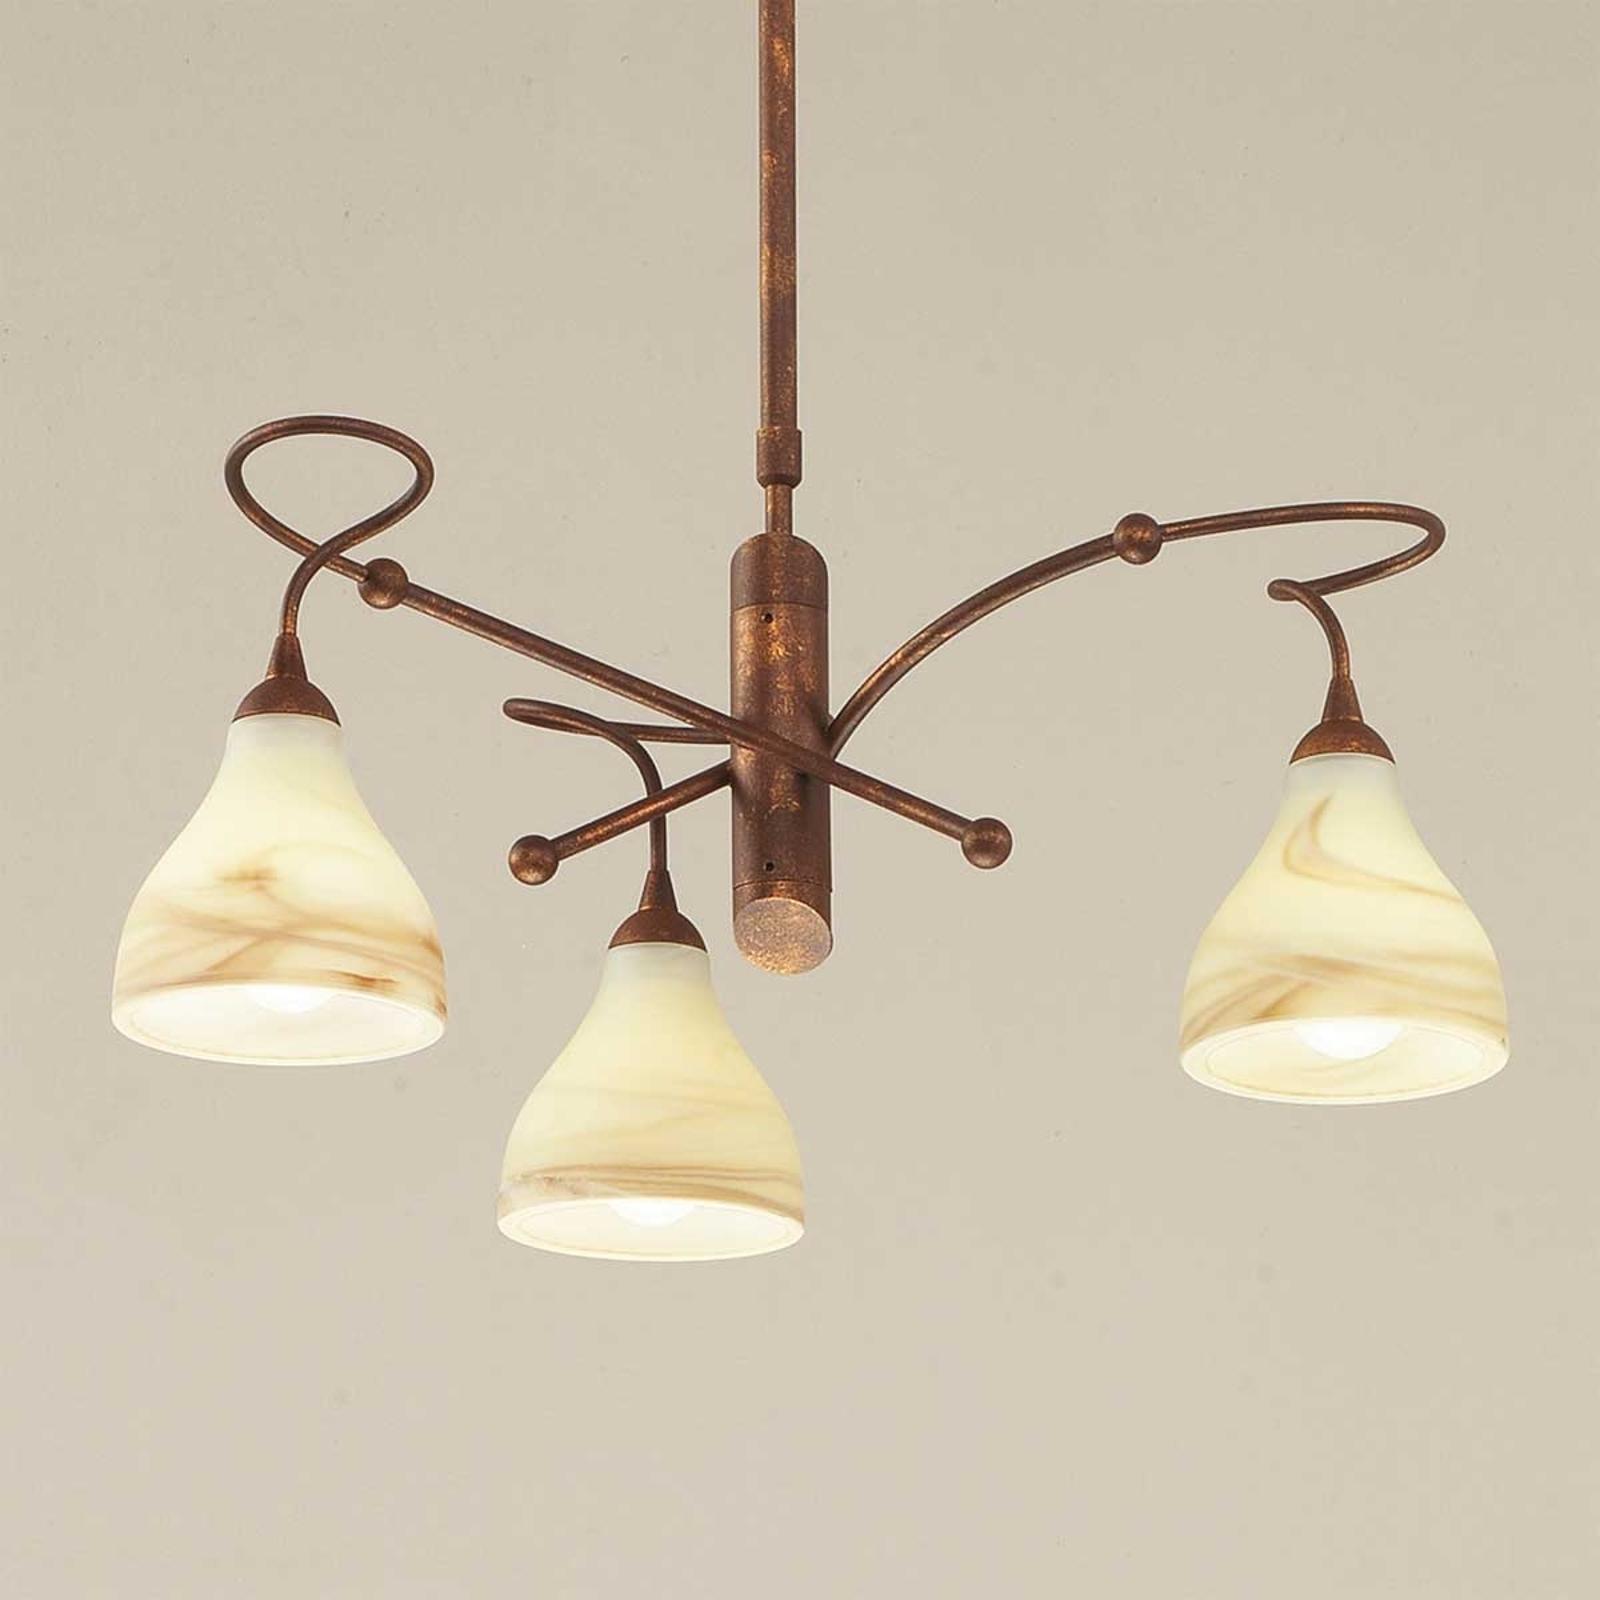 Brązowa lampa wisząca Mattia 3-punktowa